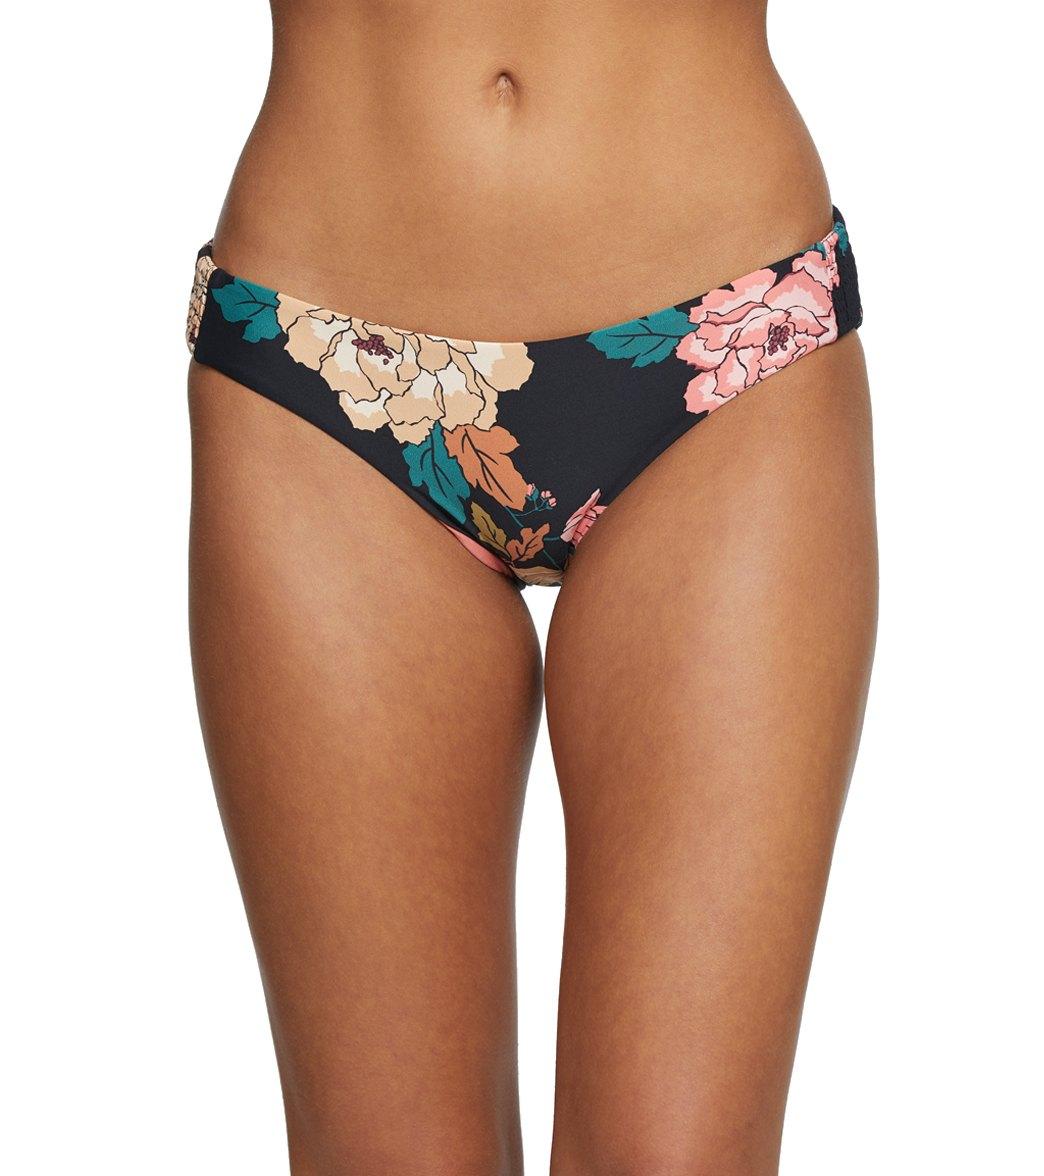 Billabong Linger On Lowrider Bikini Bottom at SwimOutlet.com ecd980bfd